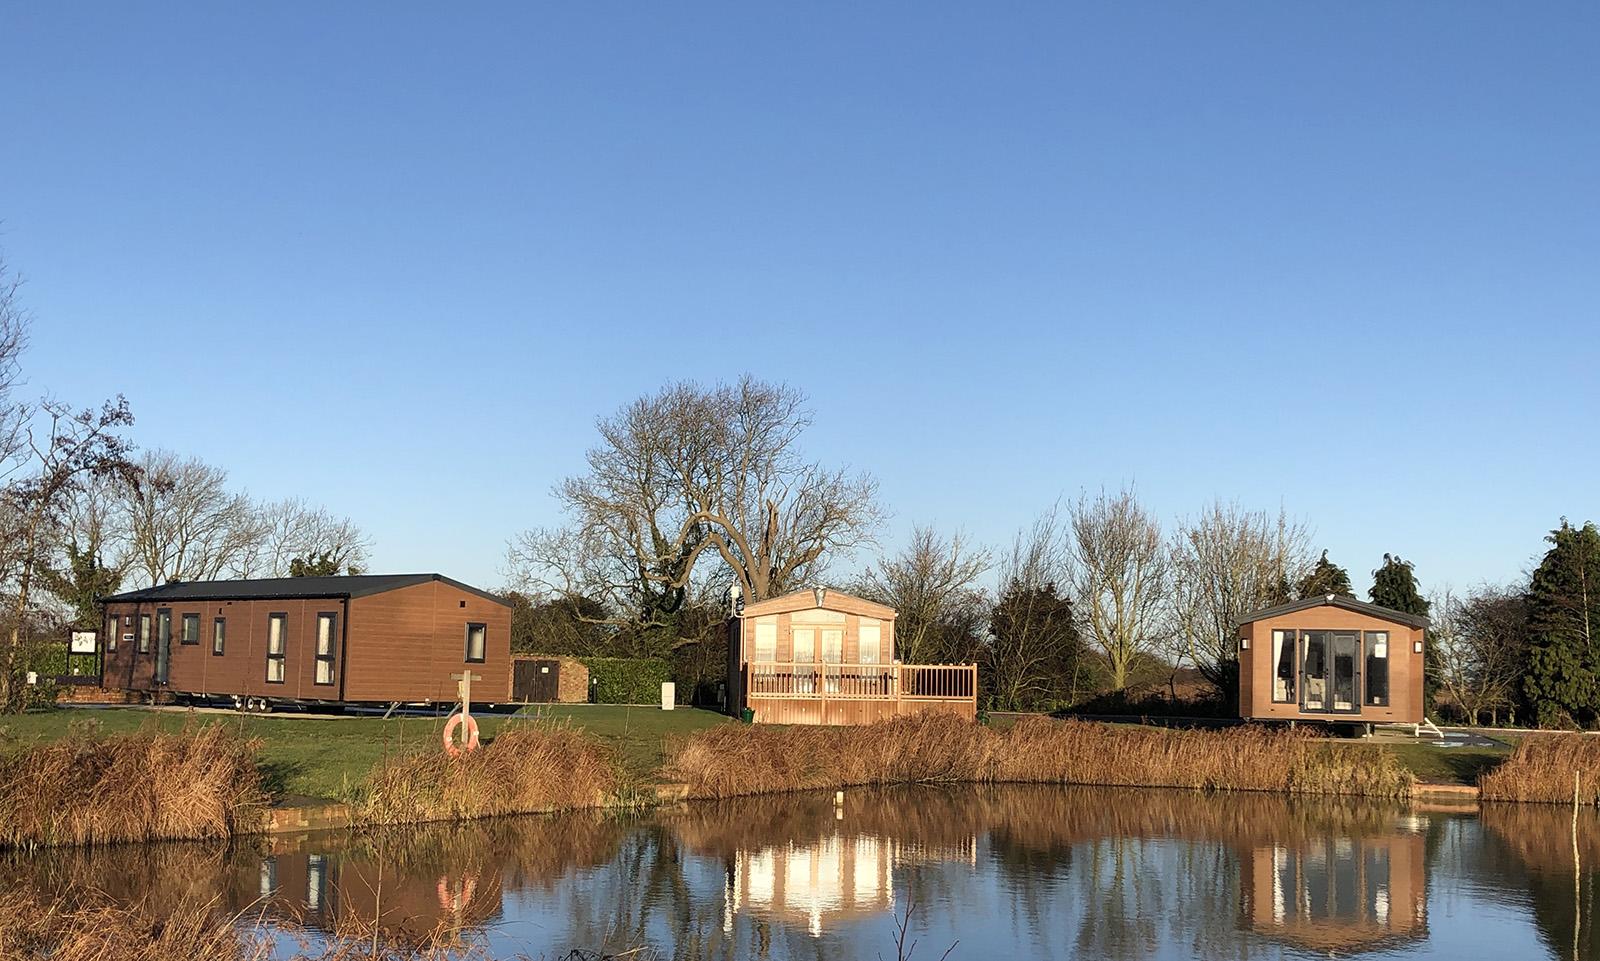 Faulkers Lakes Lodge Park